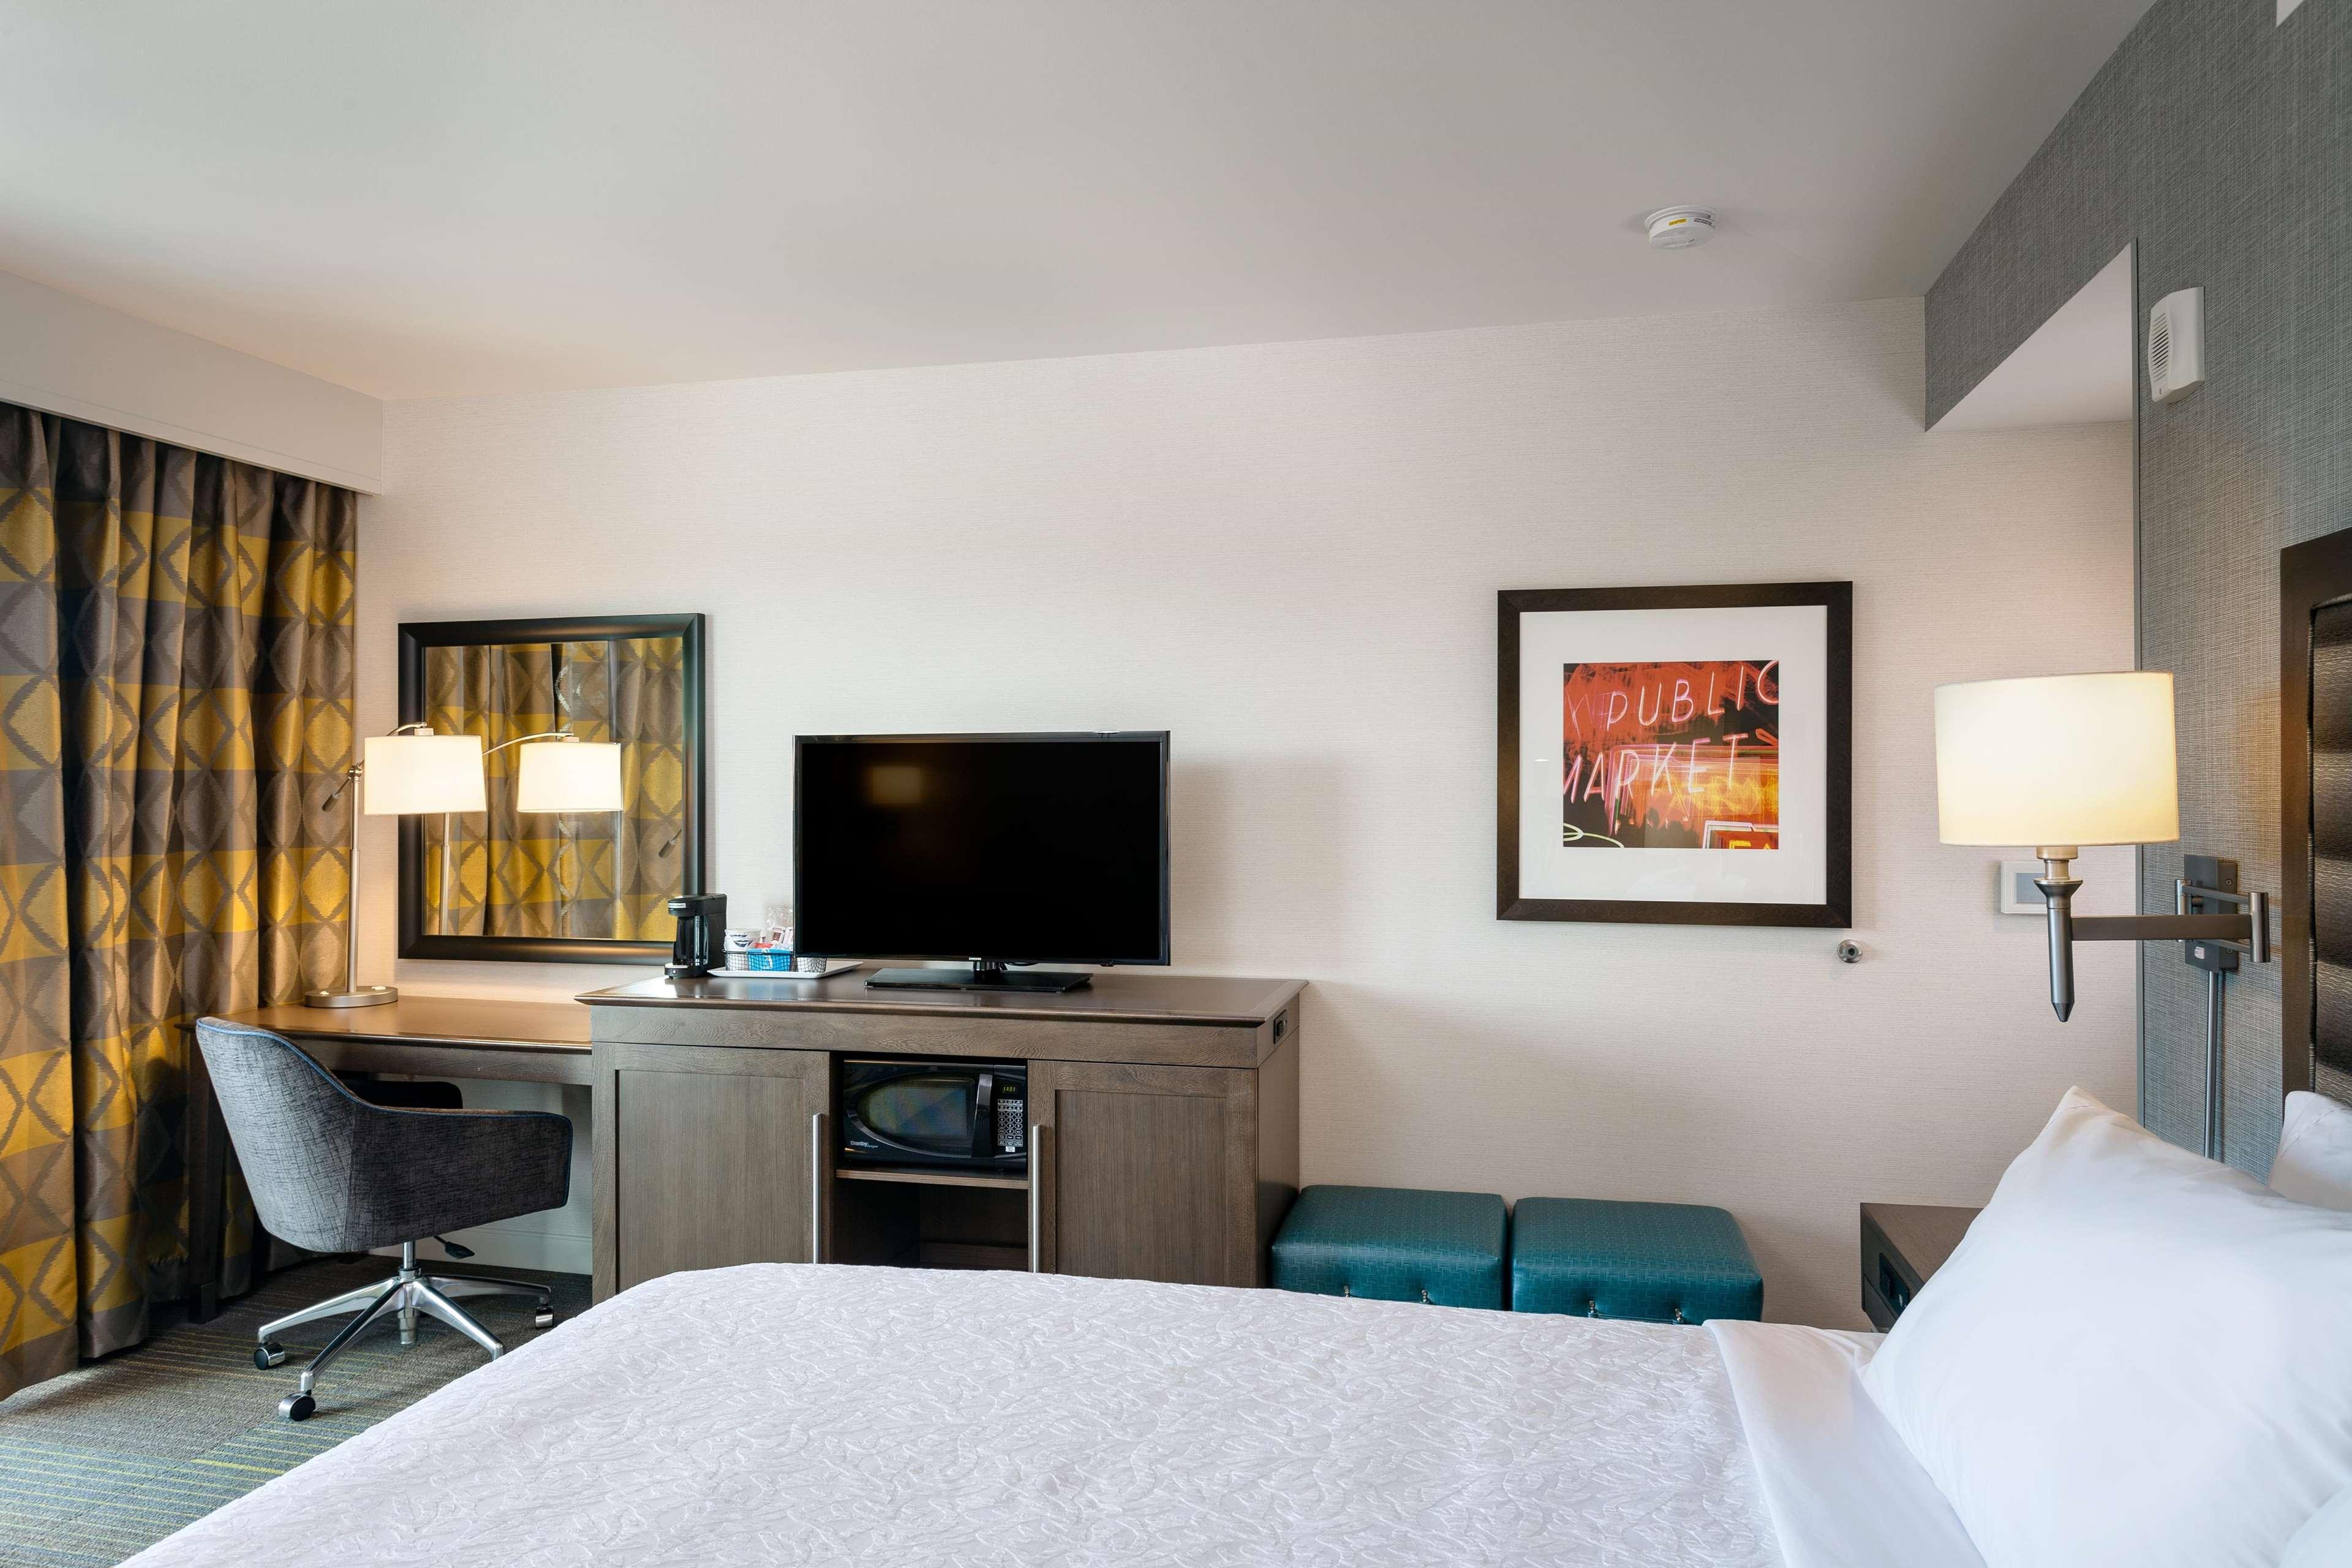 Hampton Inn & Suites by Hilton Seattle/Northgate image 23